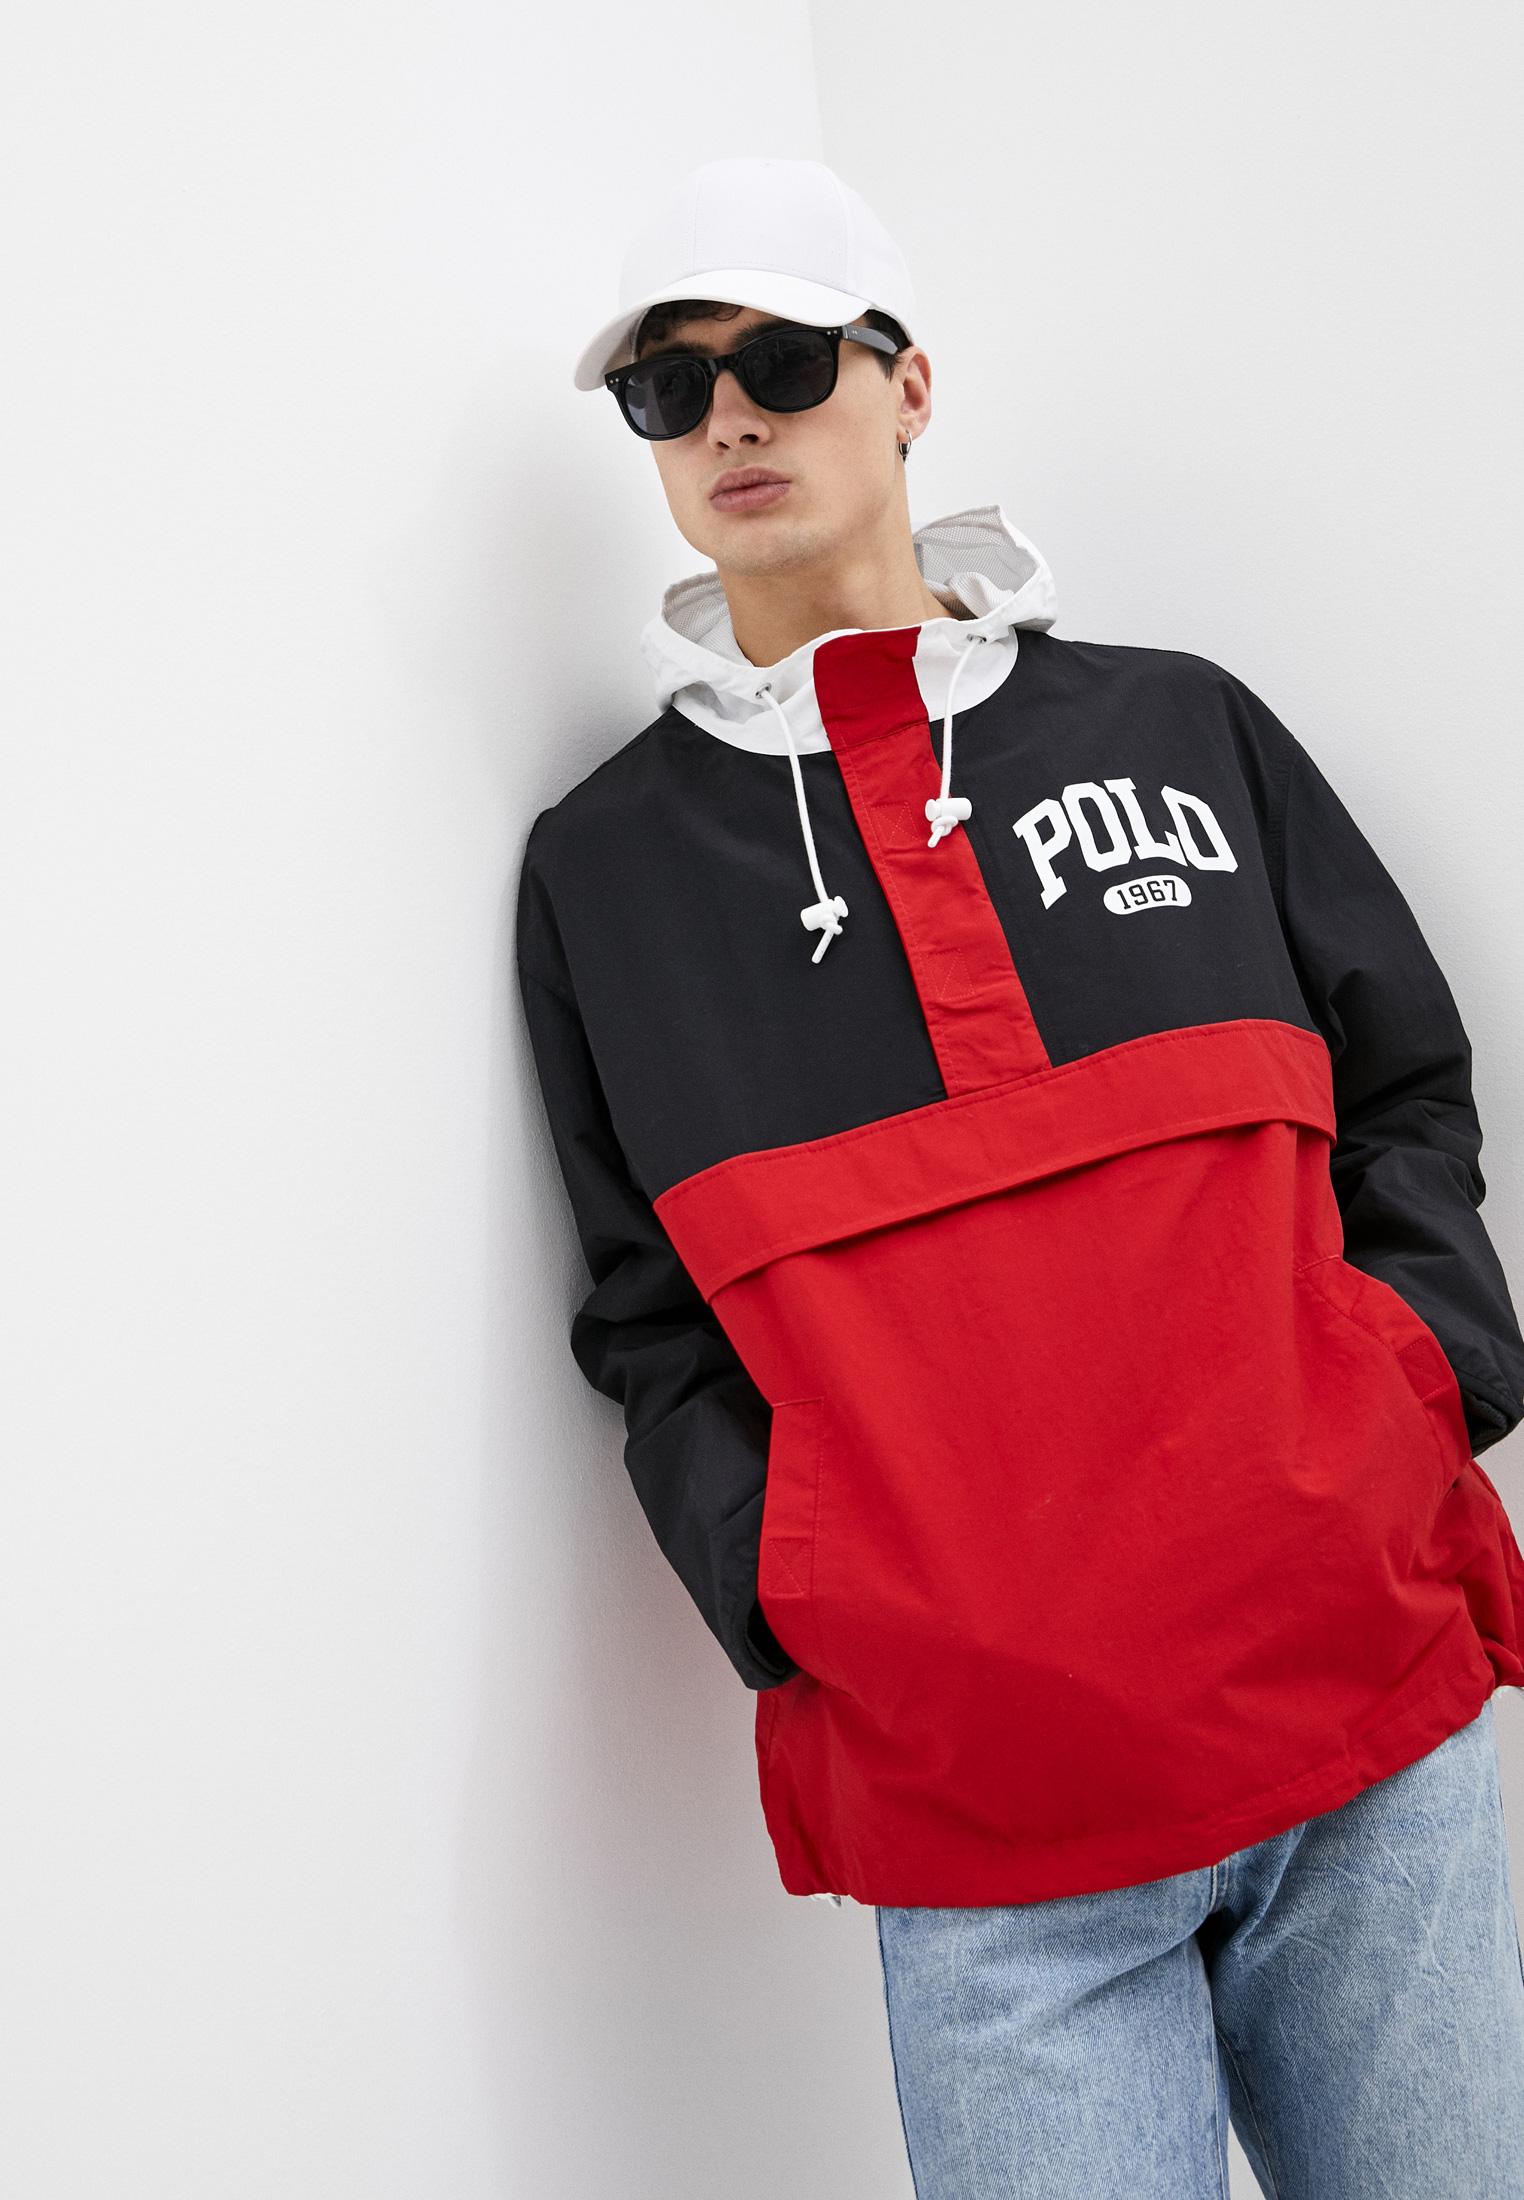 Ветровка Polo Ralph Lauren (Поло Ральф Лорен) Ветровка Polo Ralph Lauren